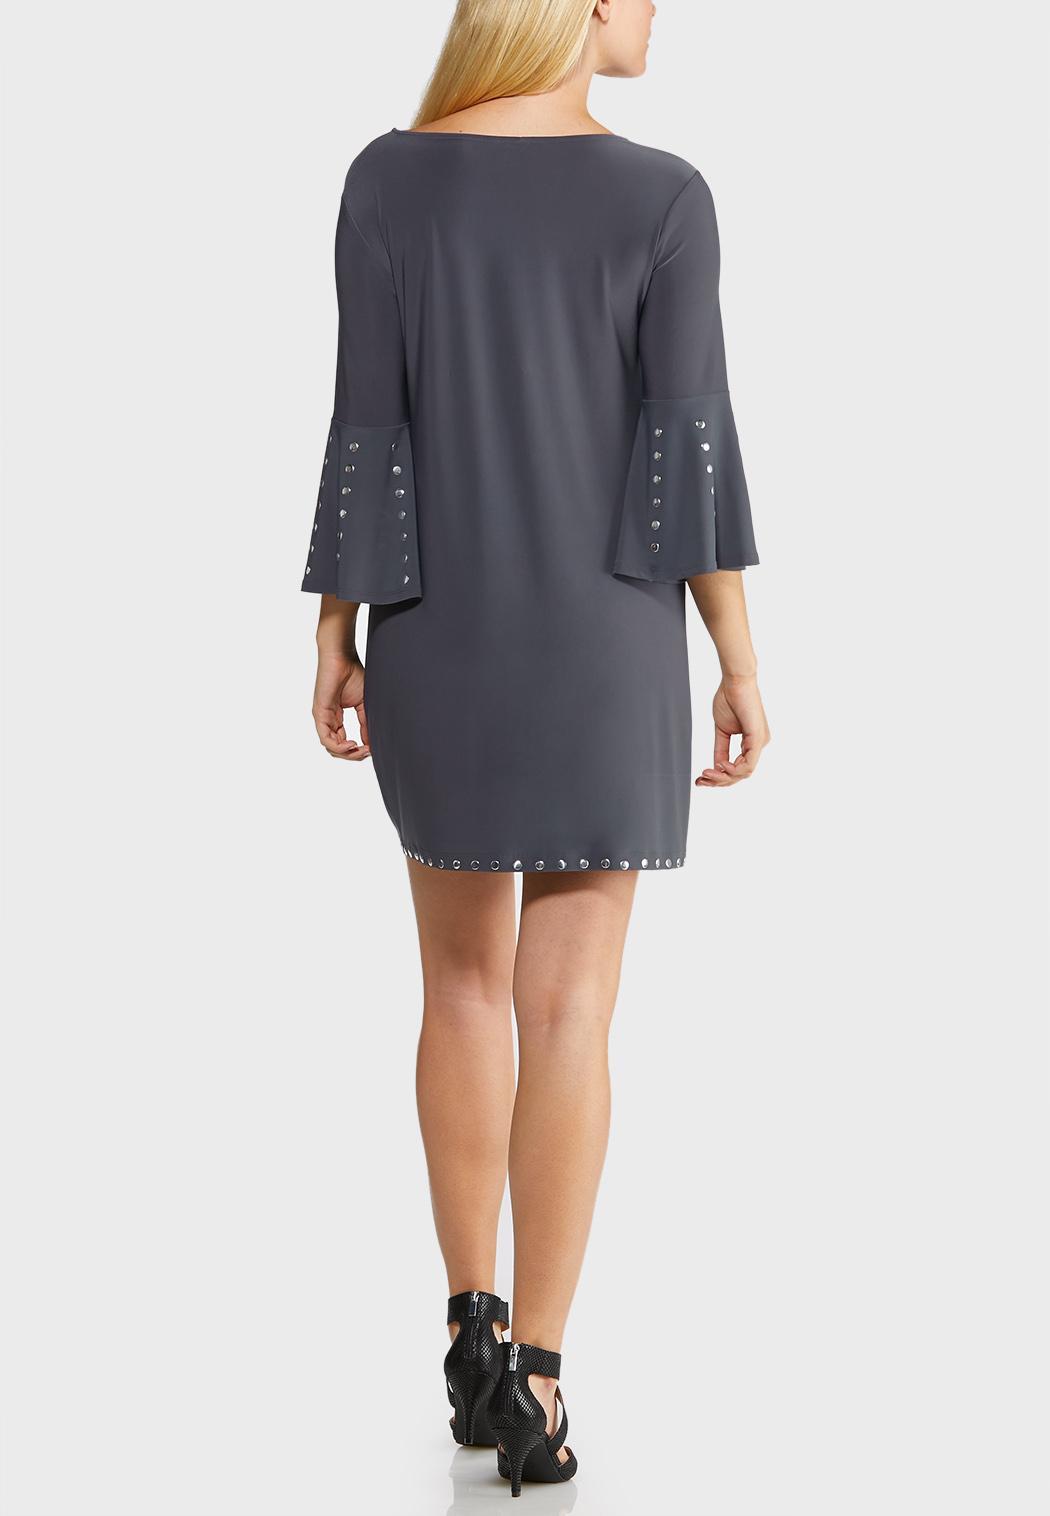 Studded Shift Dress (Item #43947913)